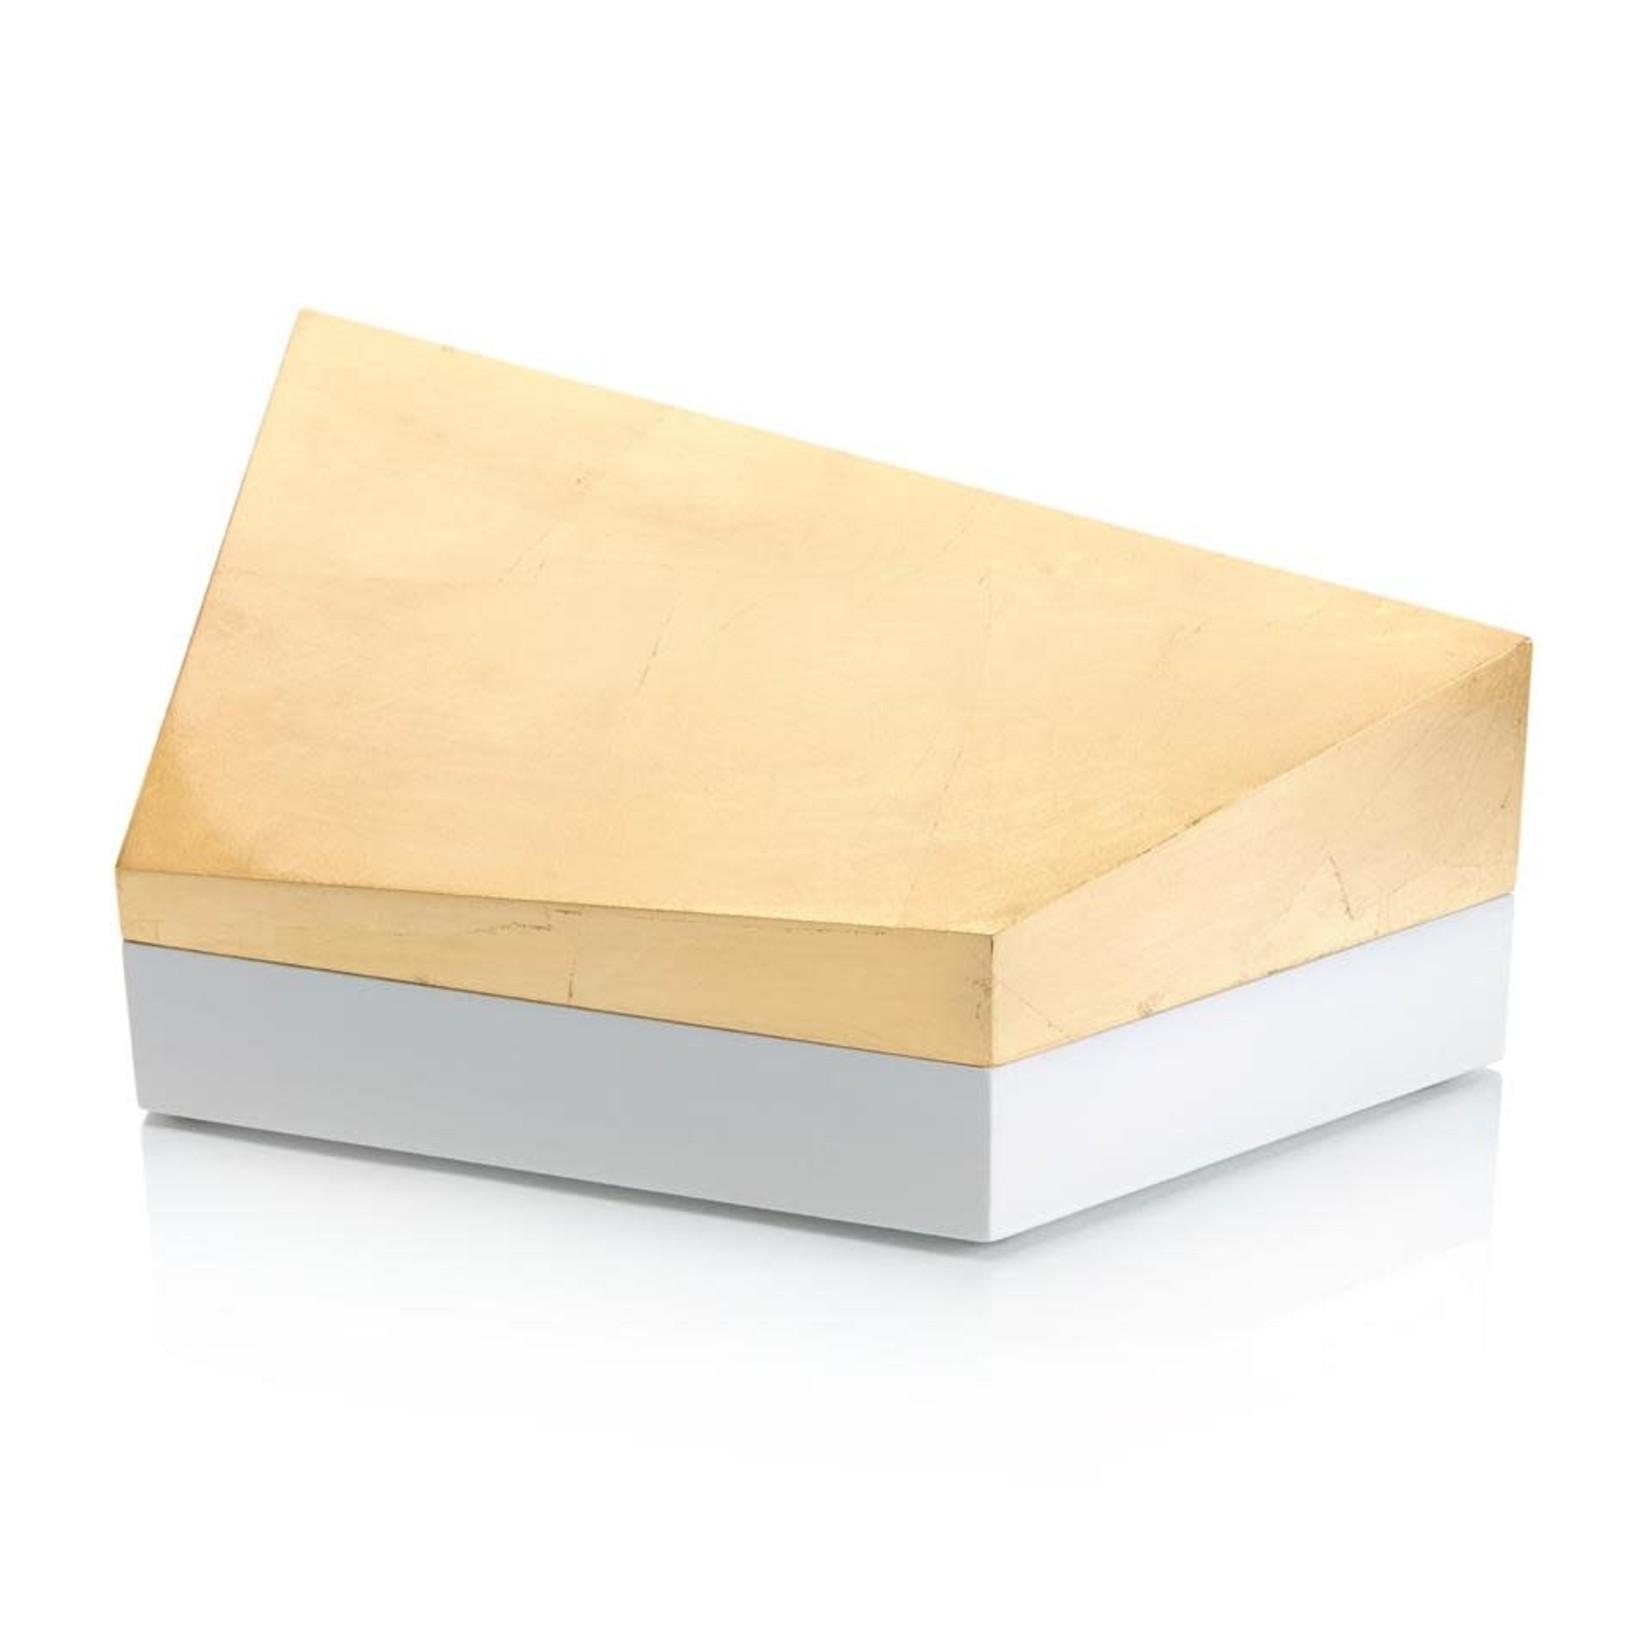 John Richard Cubist Box Gold and White II